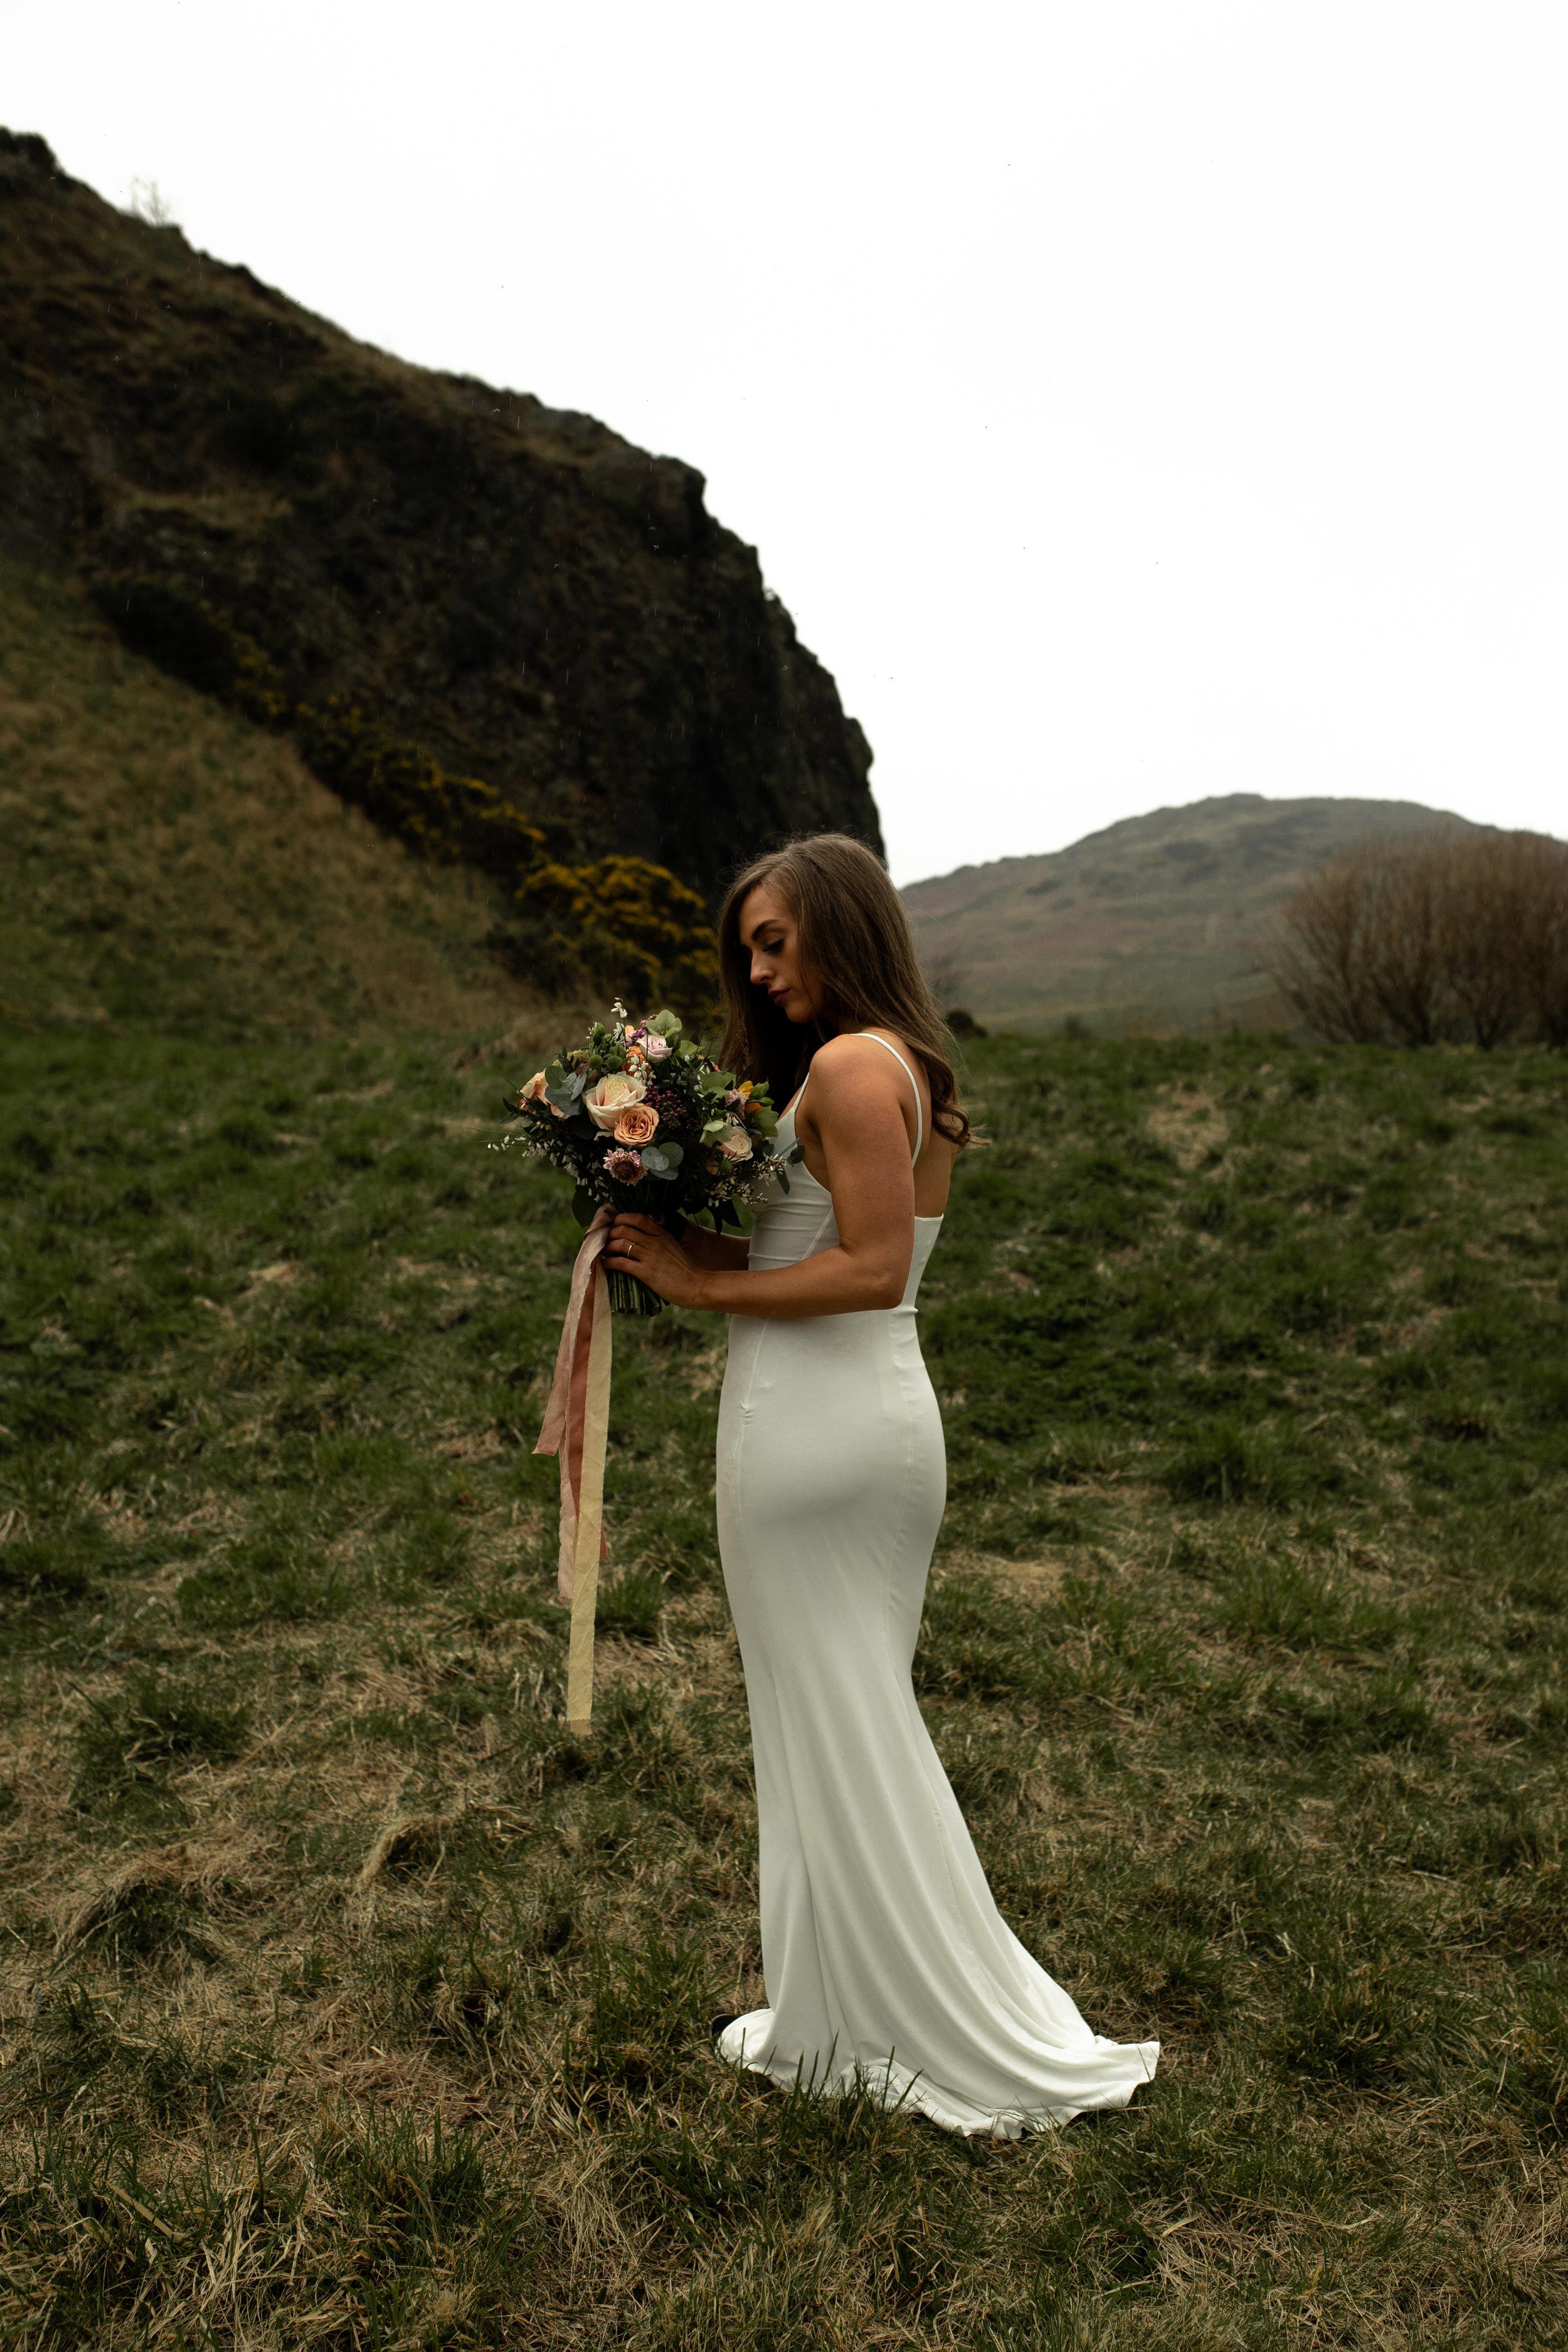 Paula_Russell_Photography_Edinburgh_Wedding_BBonnie_Flowers_4